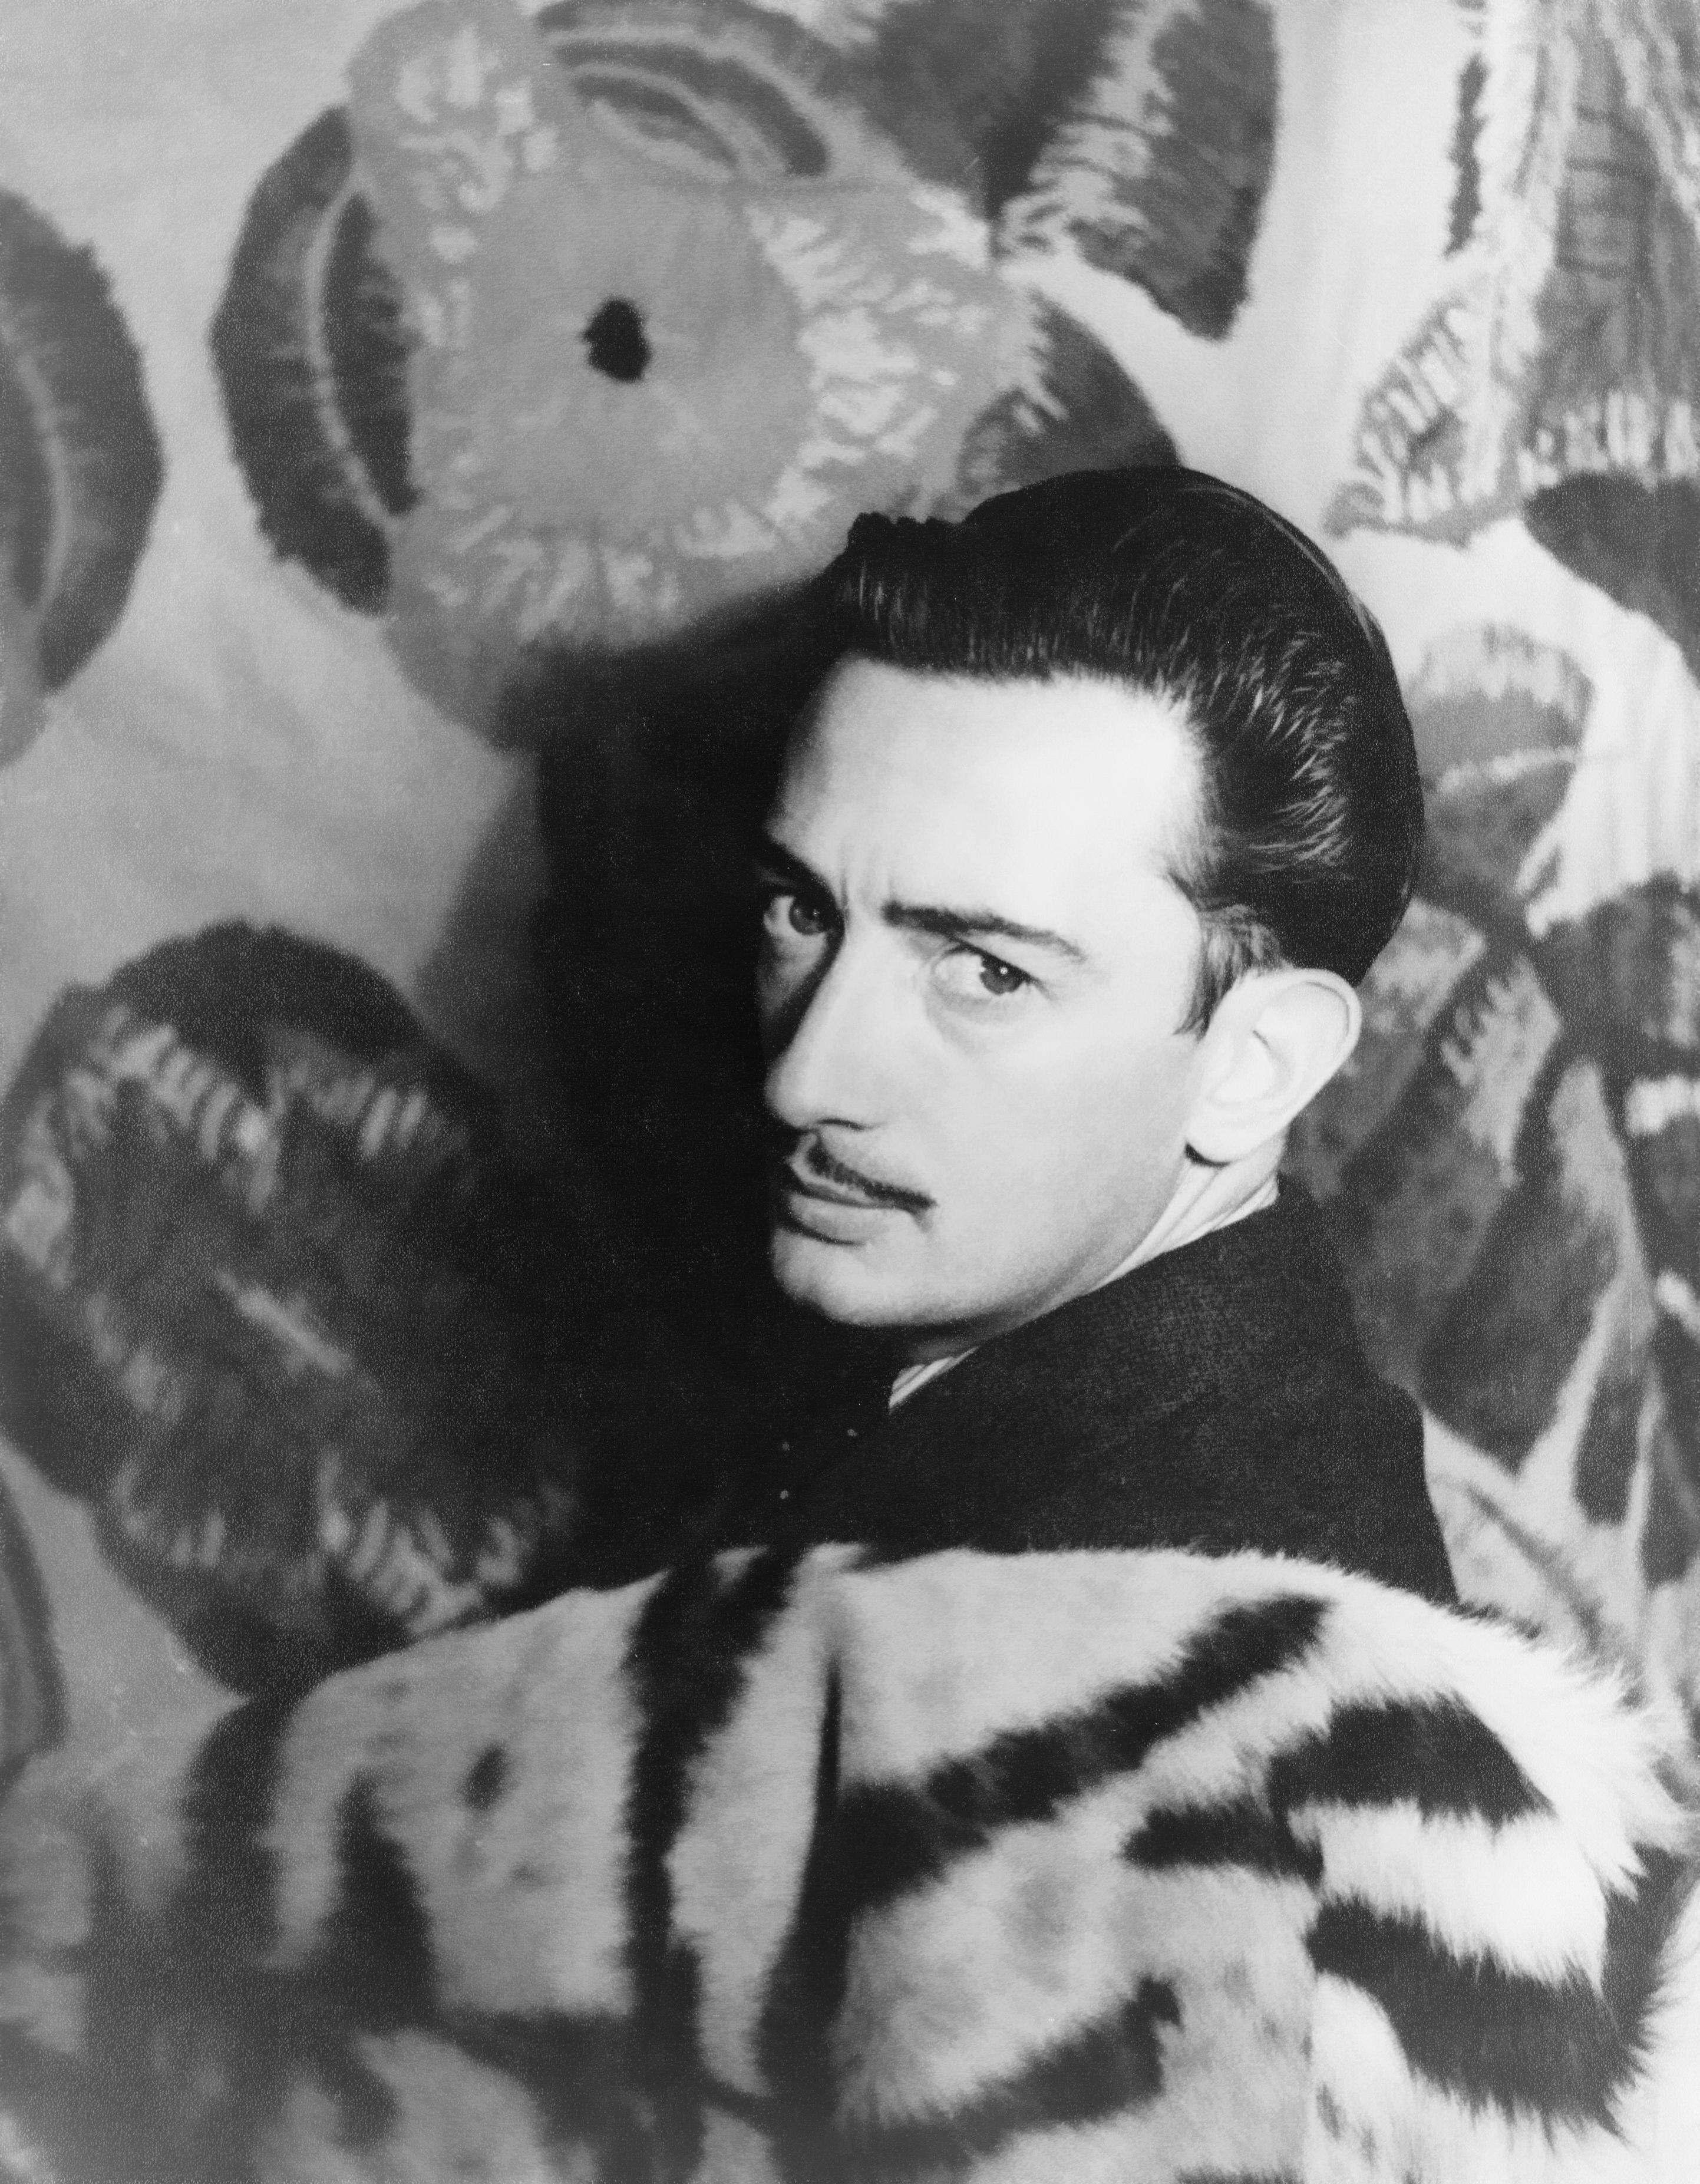 Salvador Dalí (1939).